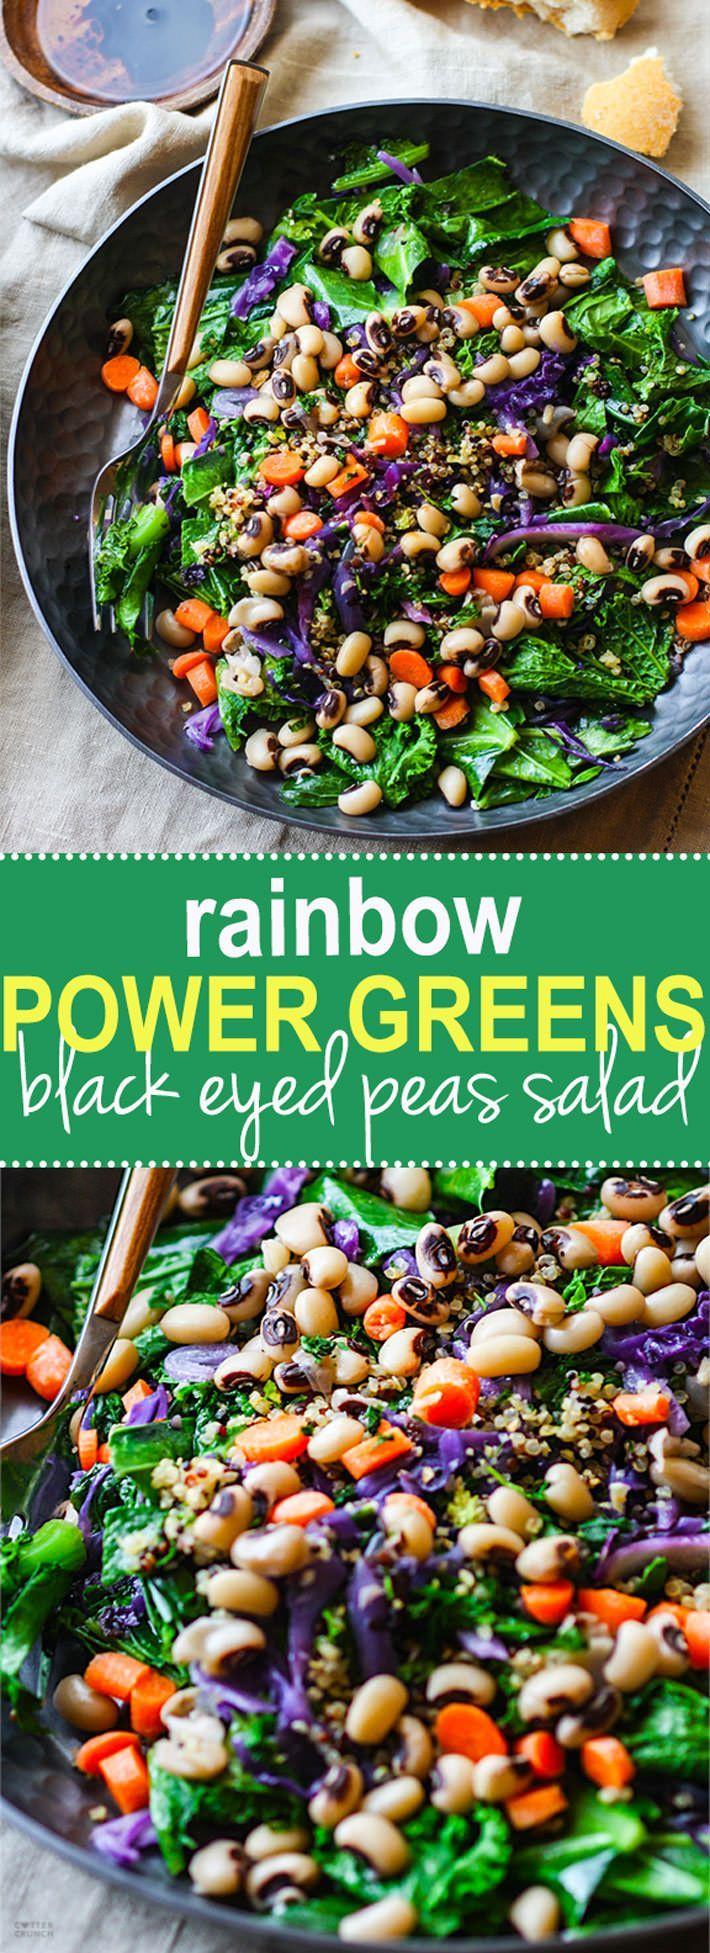 Vegan Rainbow Power Greens Salad with Black Eyed P